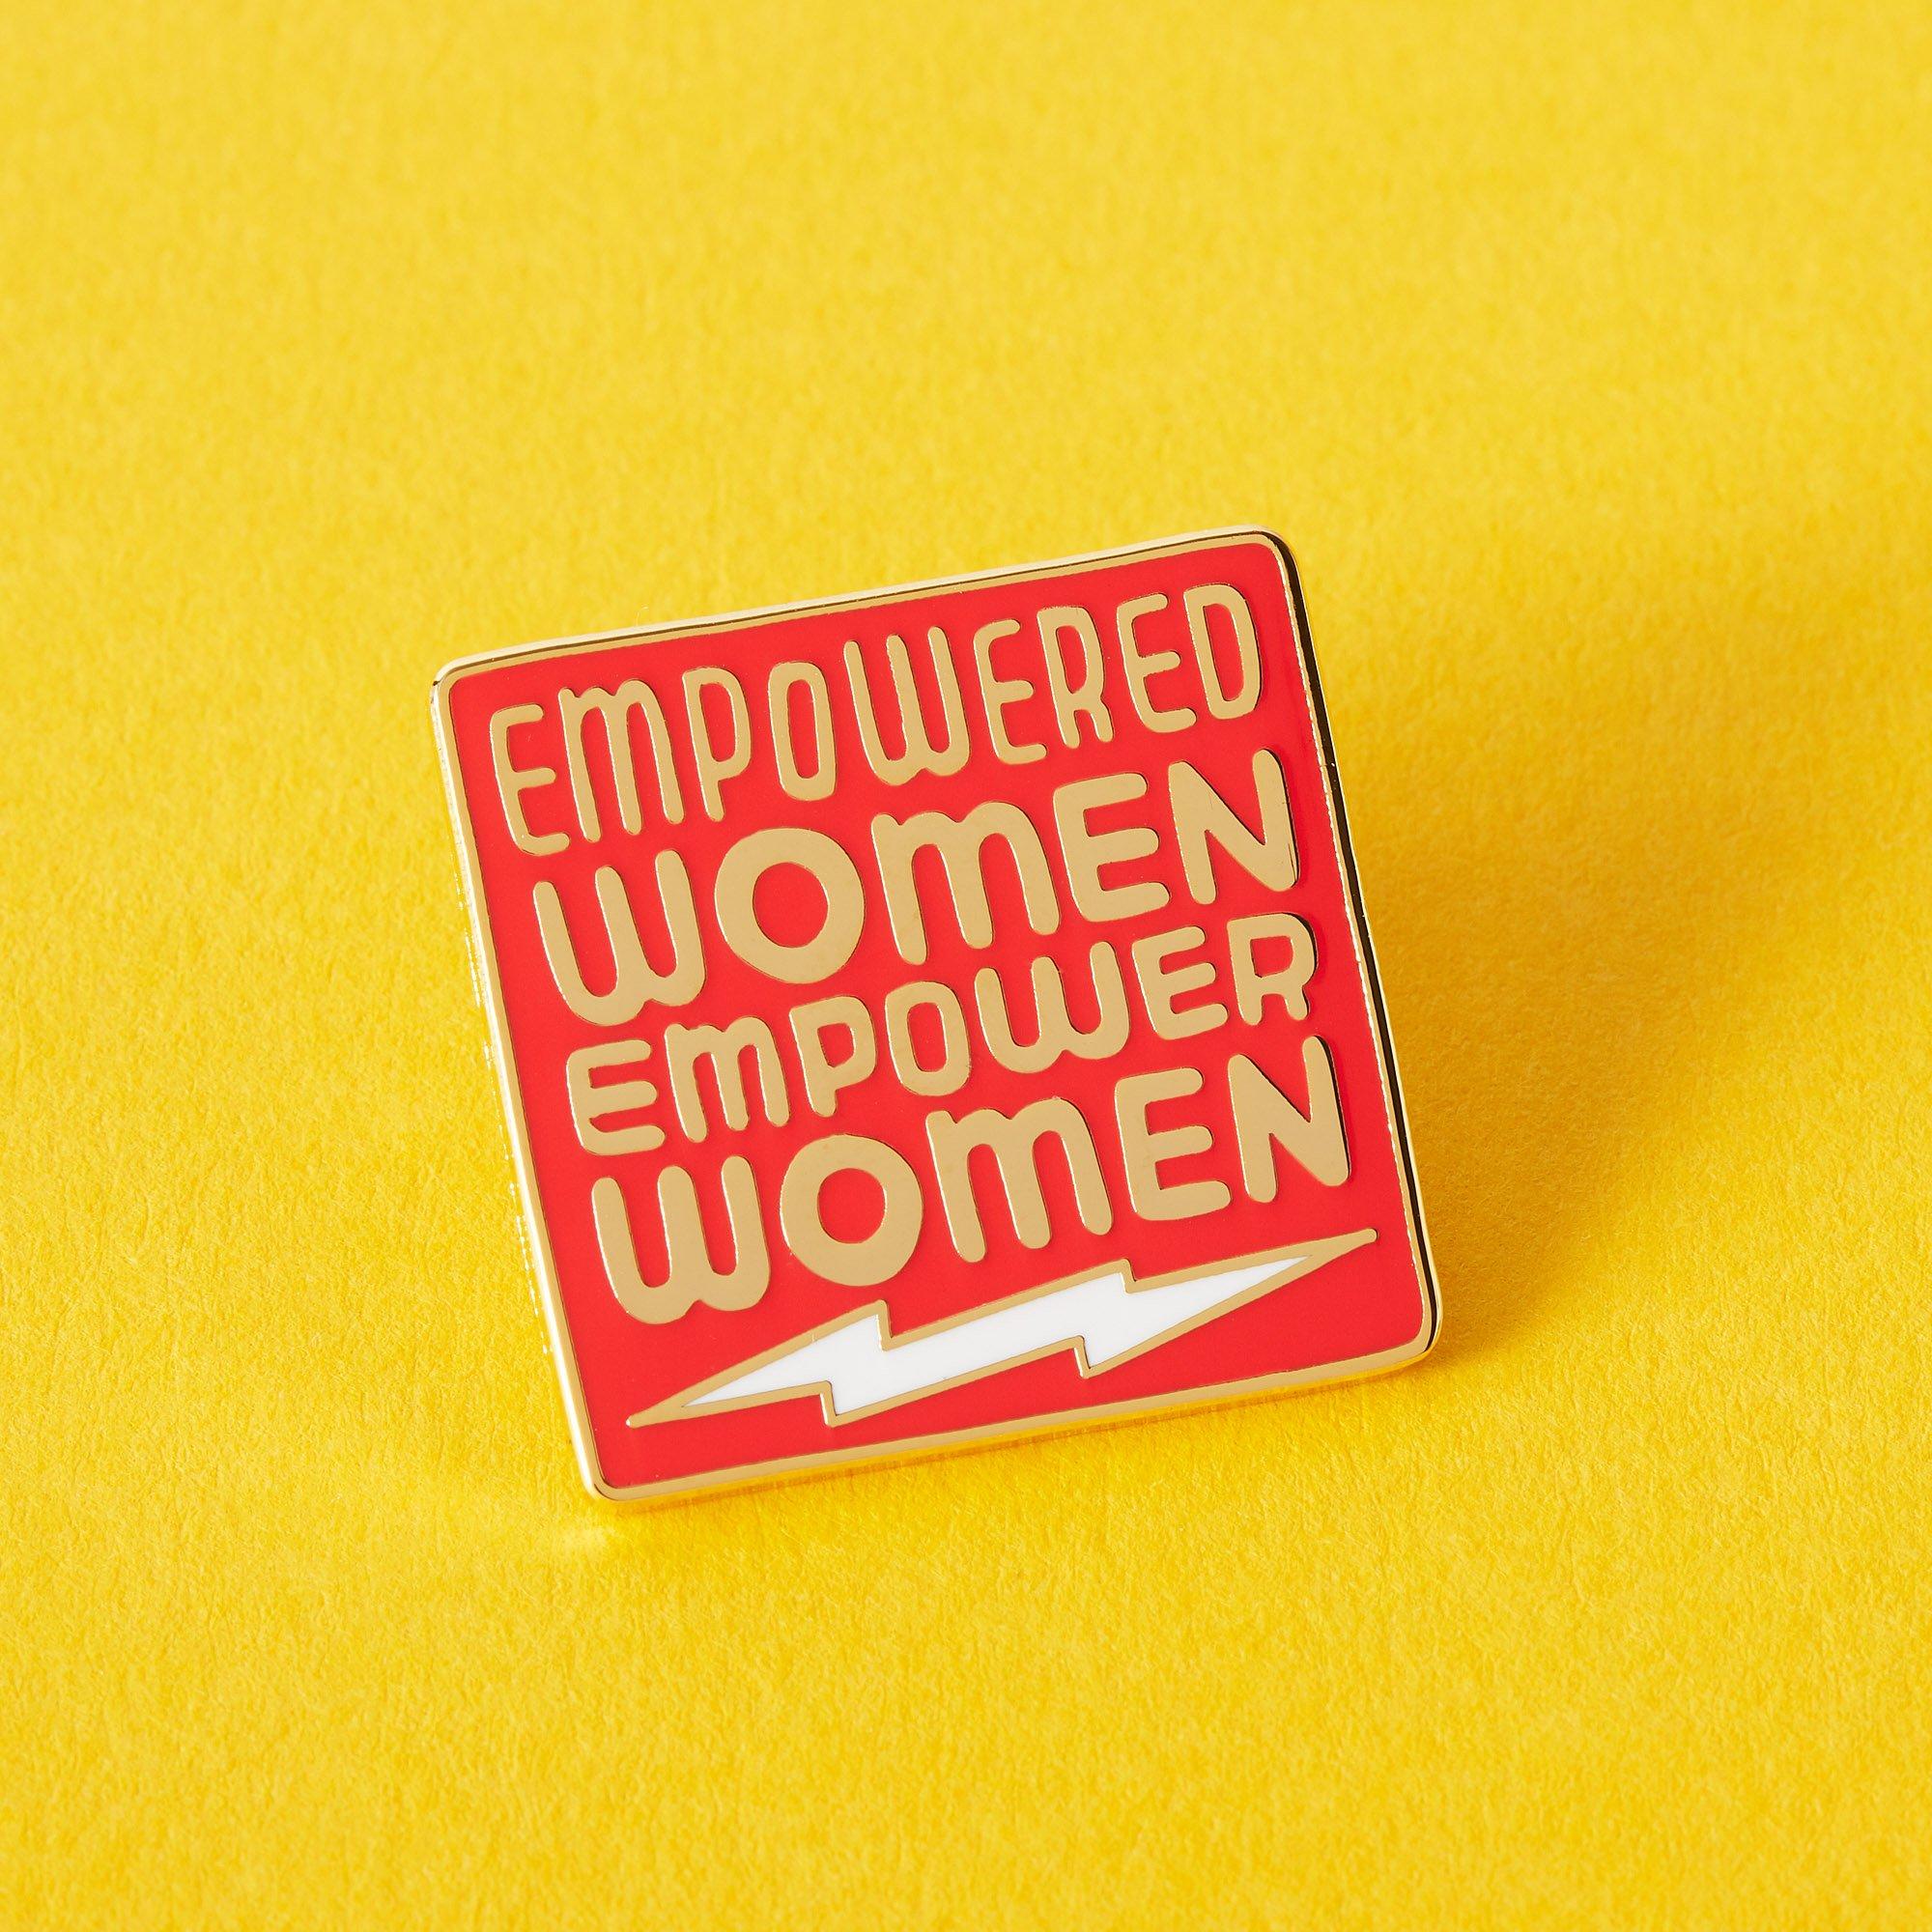 Empowered Women Empower Women Enamel Pin